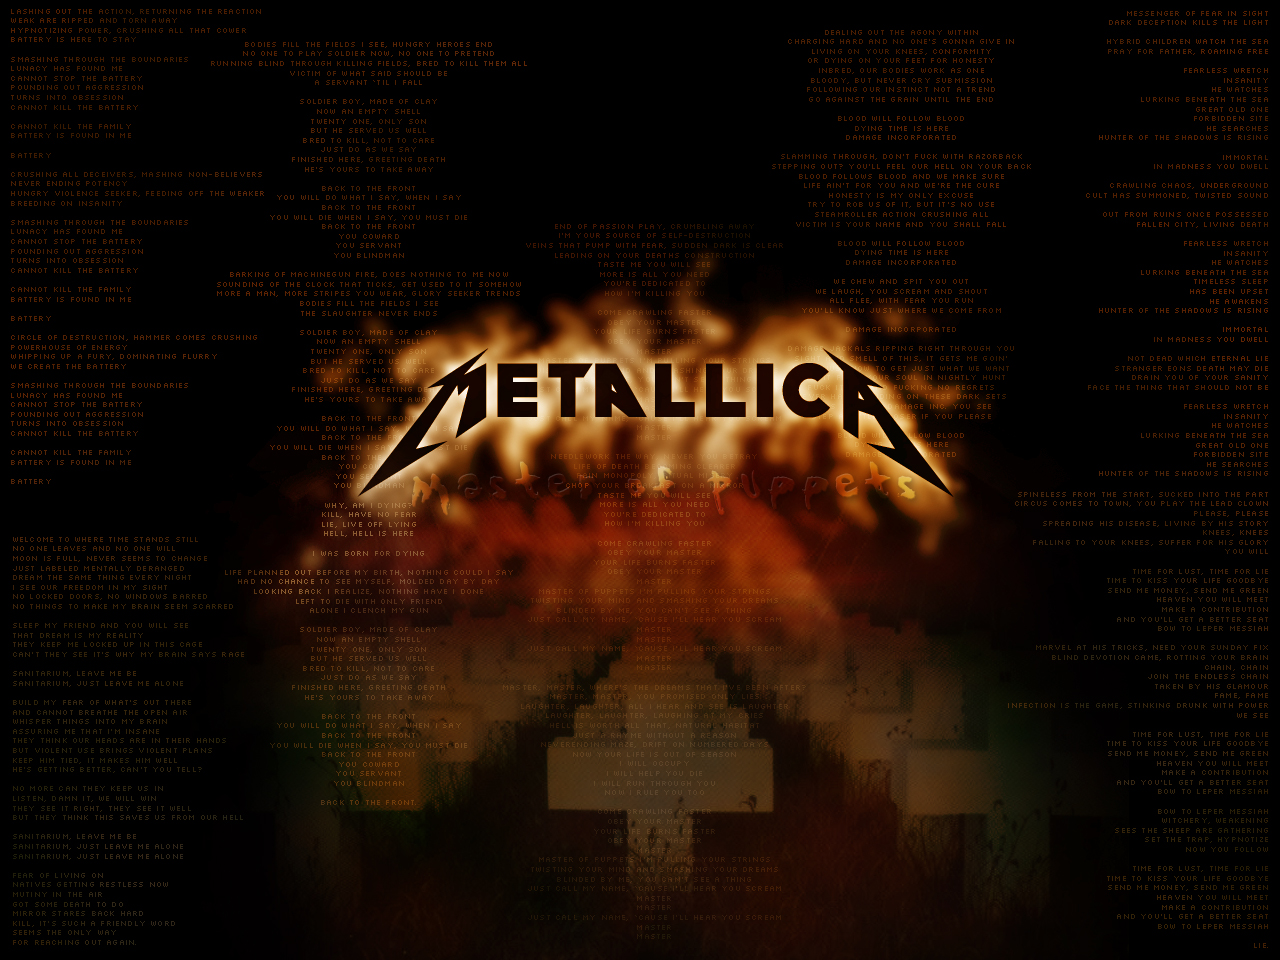 Metallica Wallpaper 1280x960 Metallica 1280x960